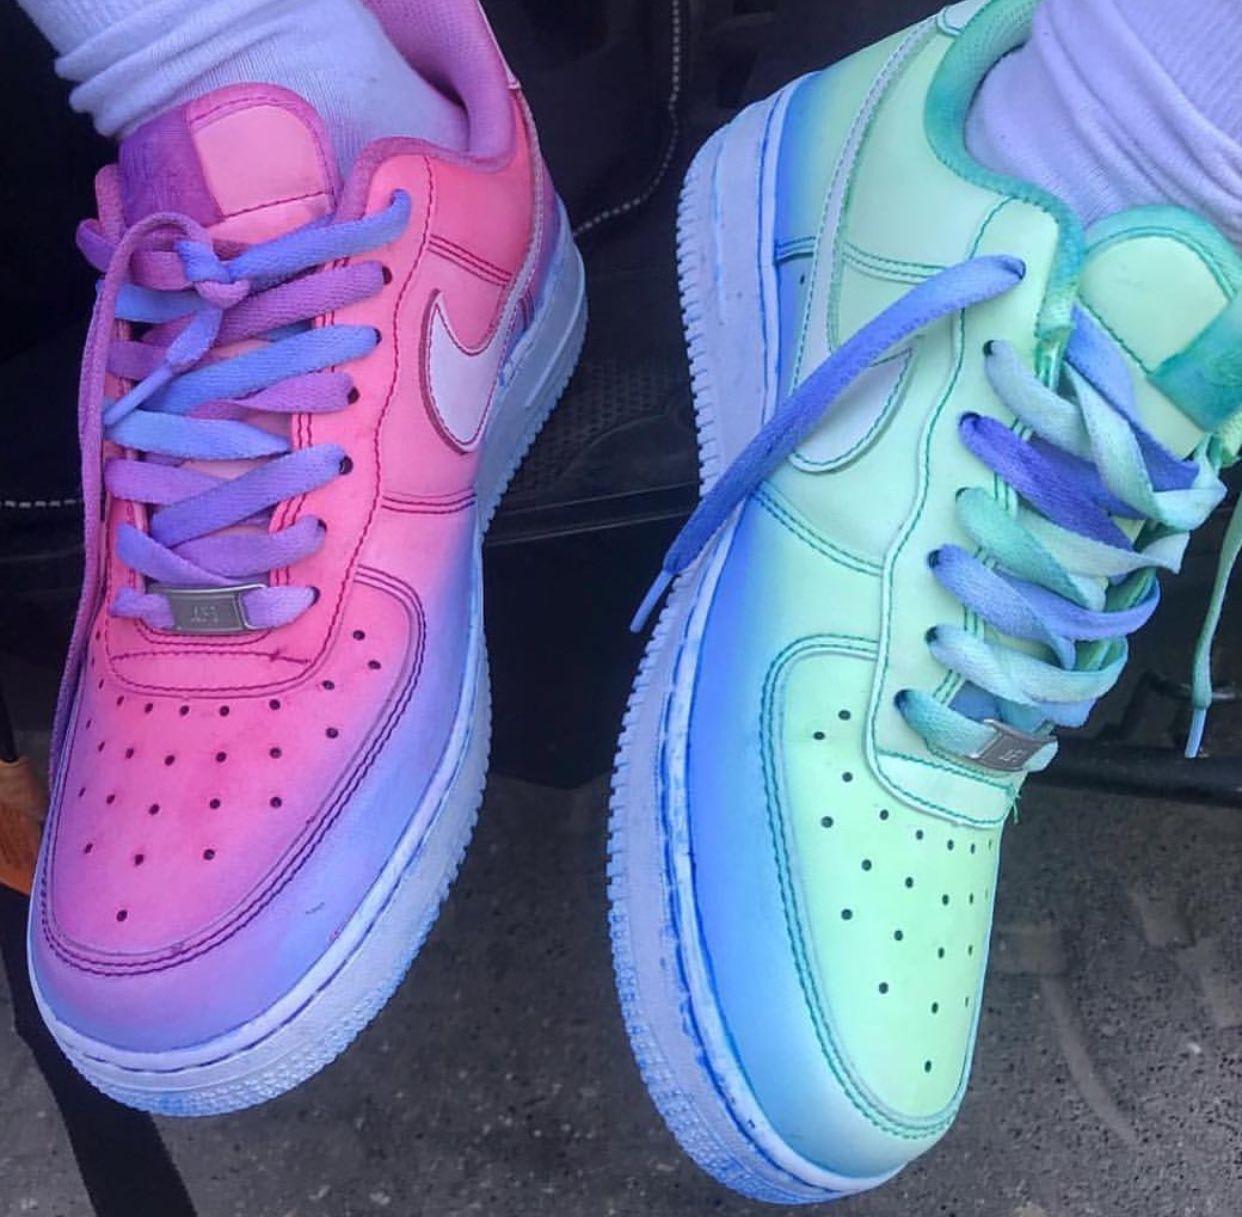 best service 5890d f3da1 Shoe. Nike Tennis. Nike Tennis. Nike Trainers. New Adidas Shoes. Custom Air  Force 1, Custom Sneakers, Custom Shoes, Custom Af1, Sneakers Fashion